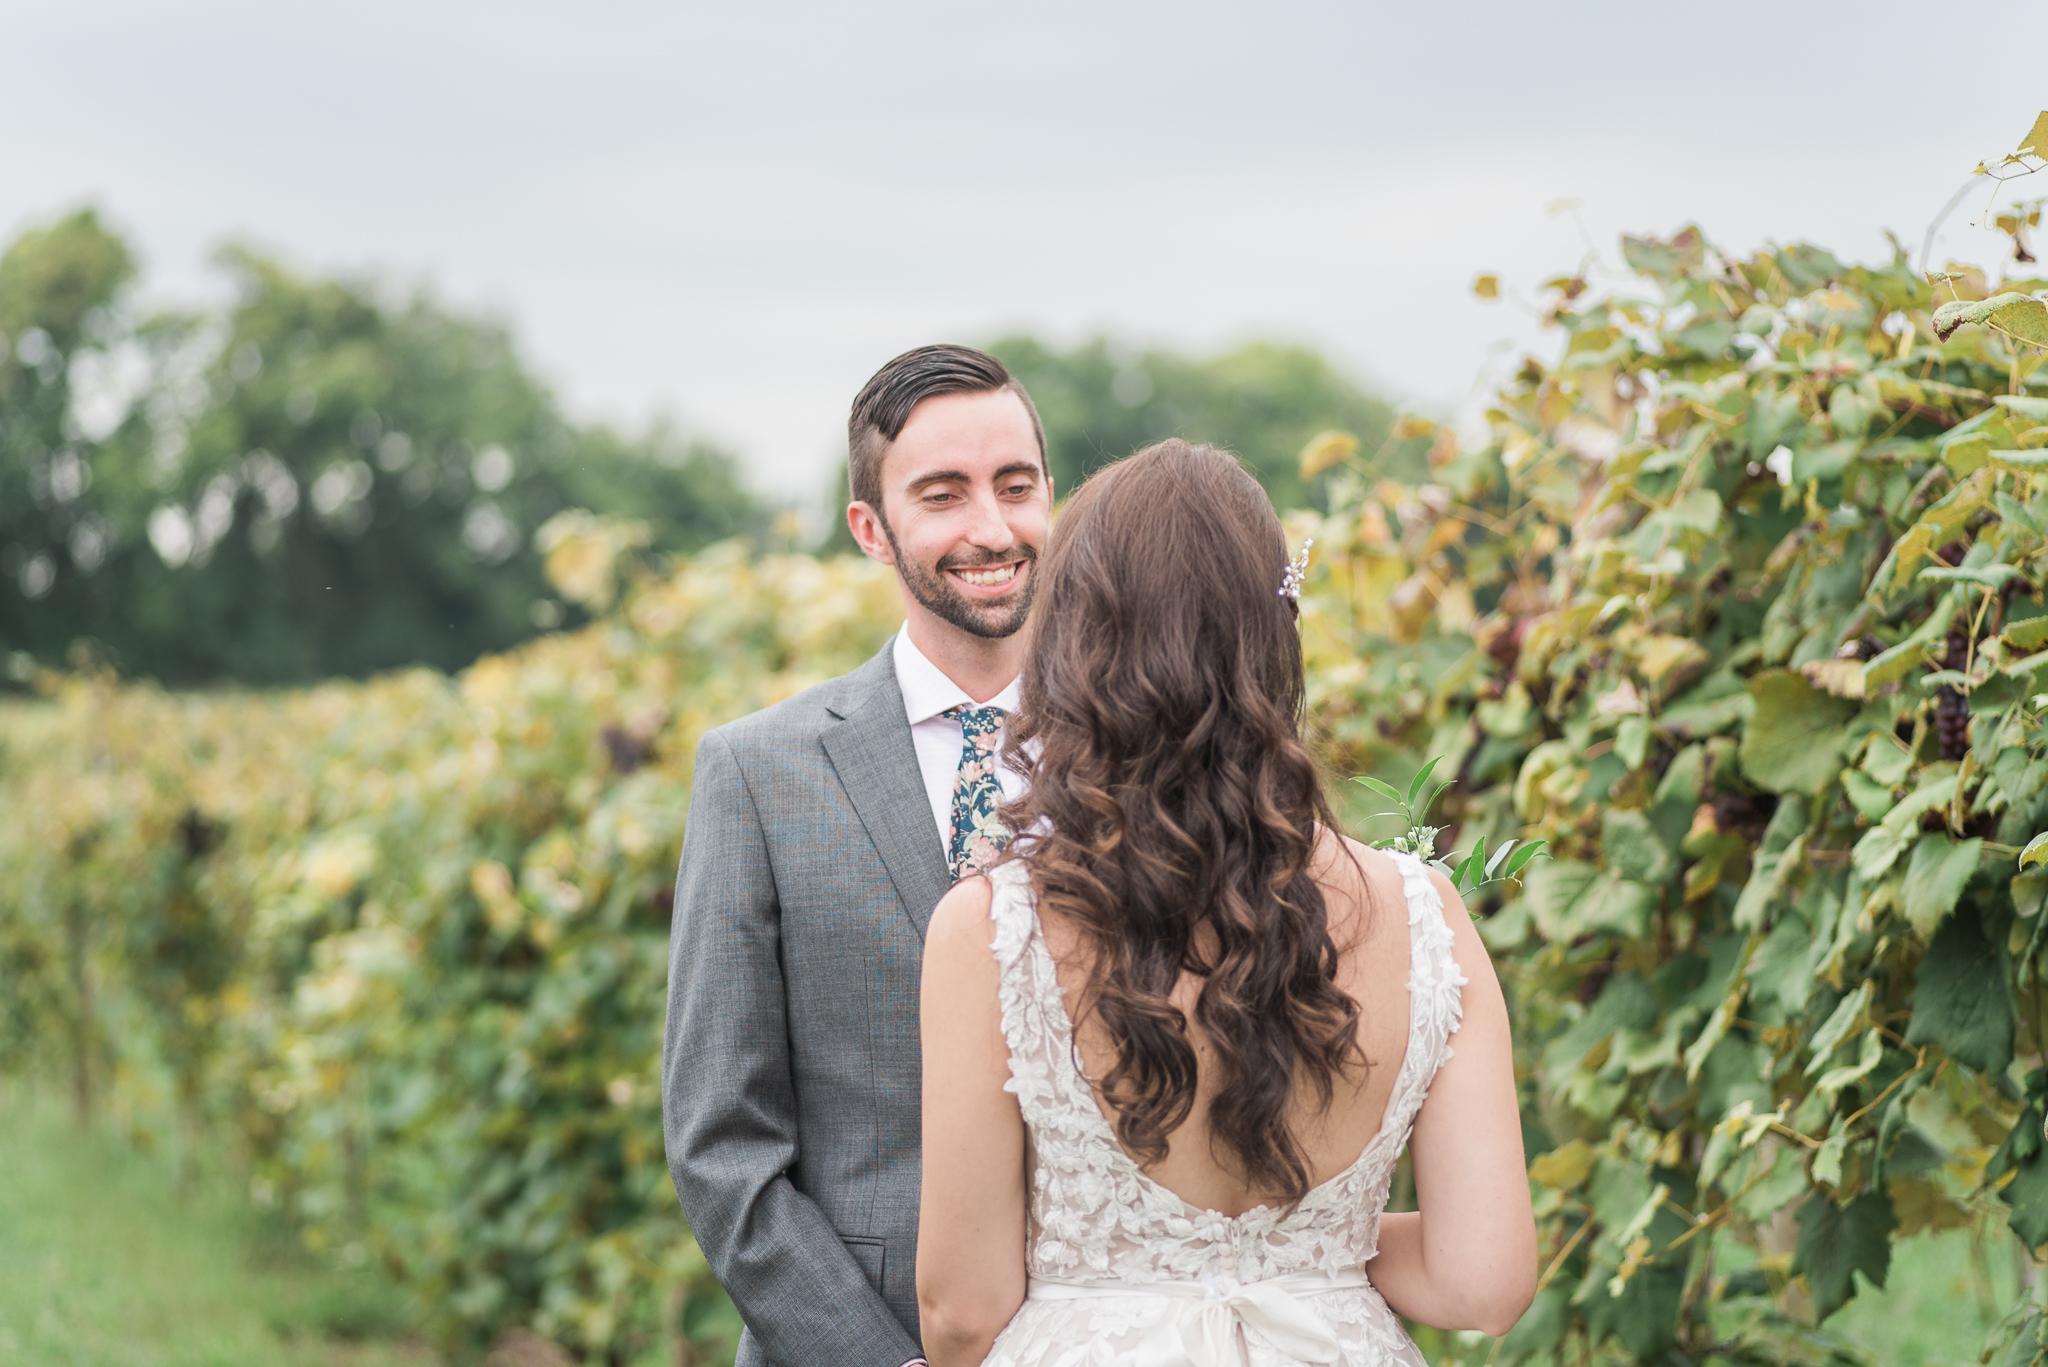 Sycamore at Mallow Run Wedding5468.jpg